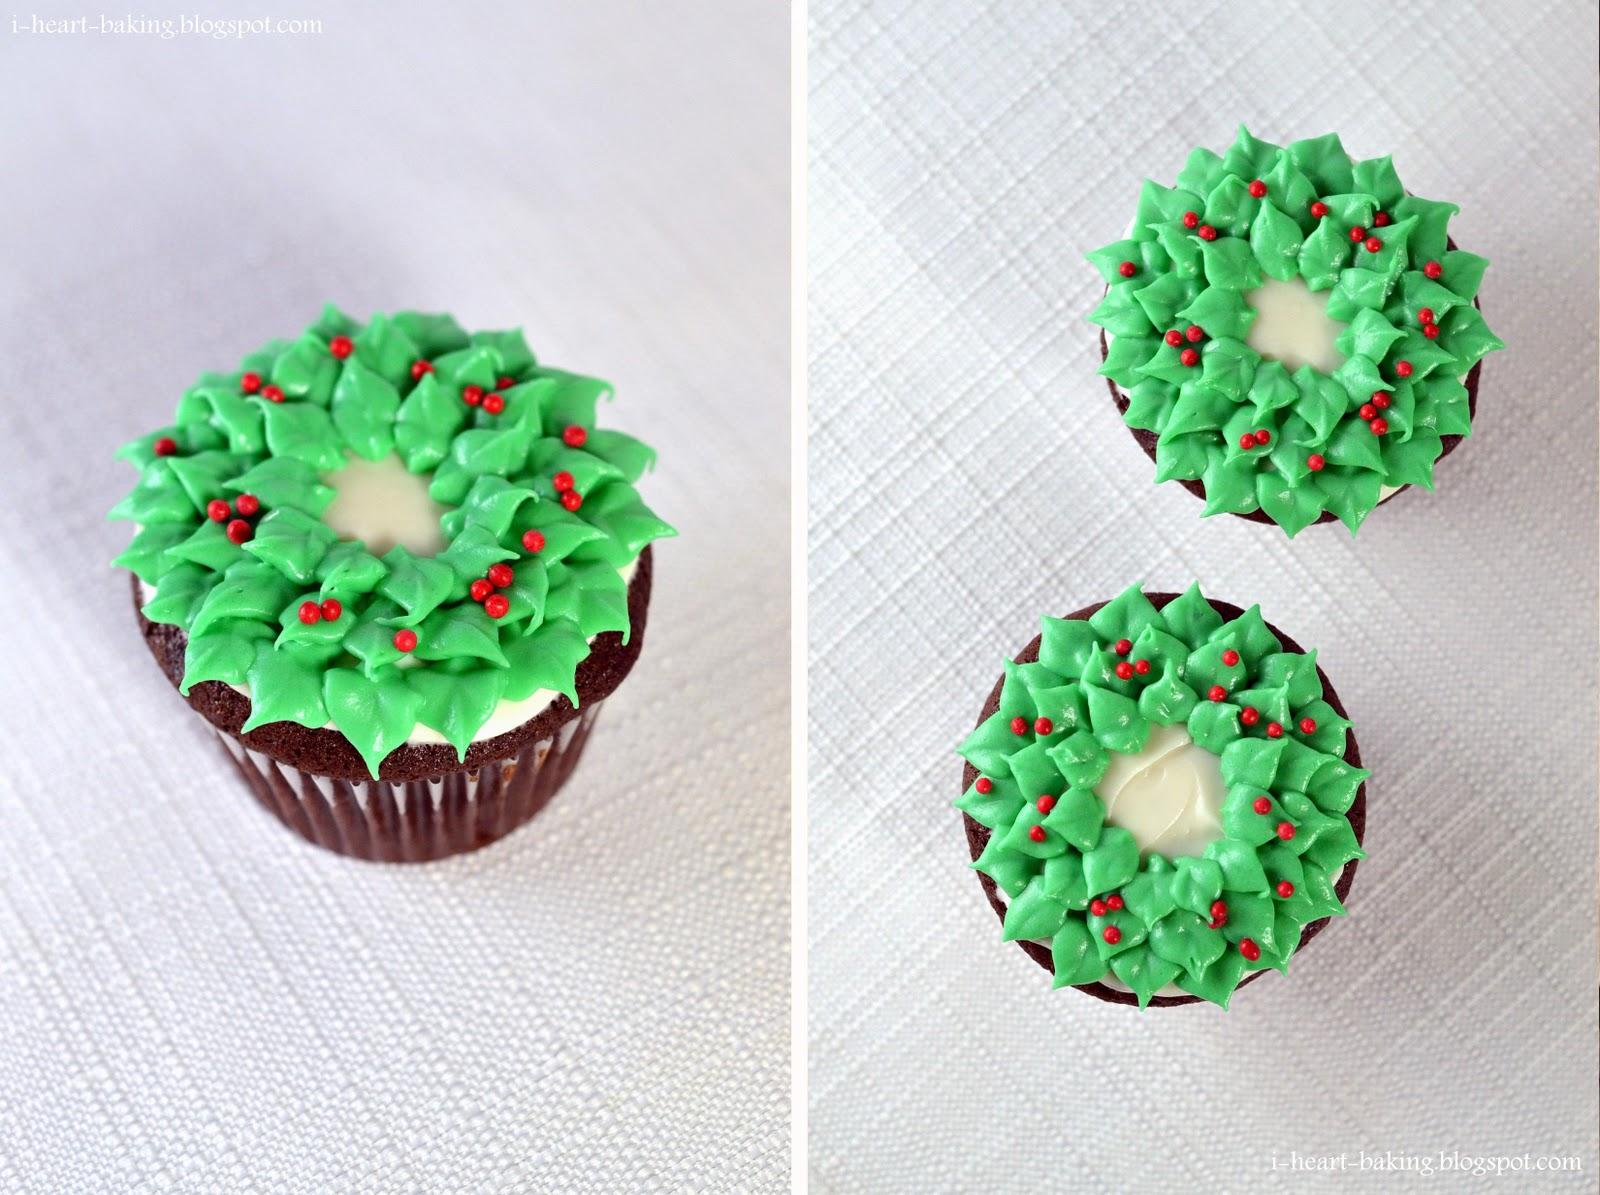 i heart baking!: December 2011